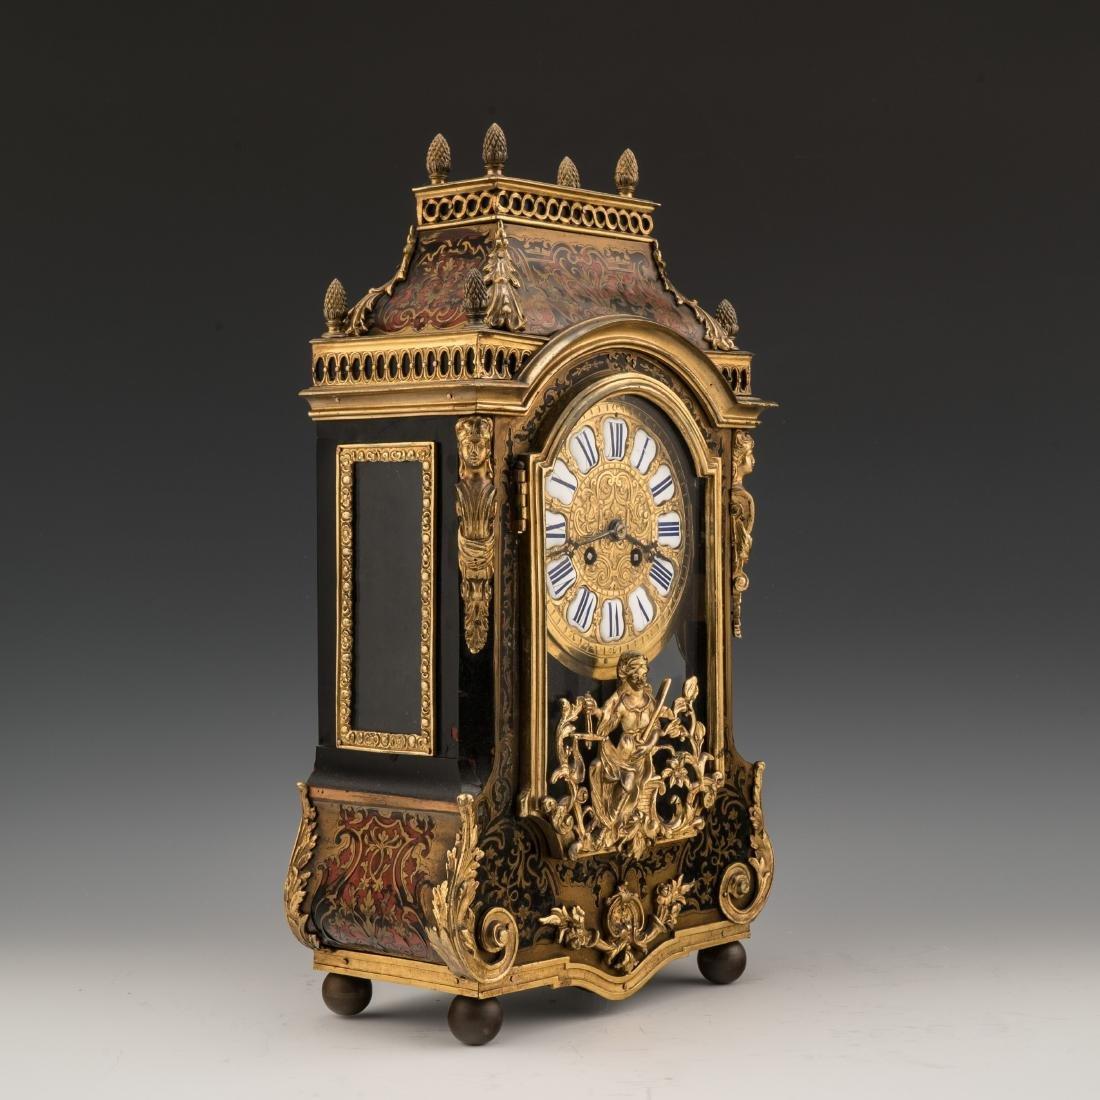 A LOUIS XVI-STYLE FAUX BOULLE FIGURAL BRACKET CLOCK